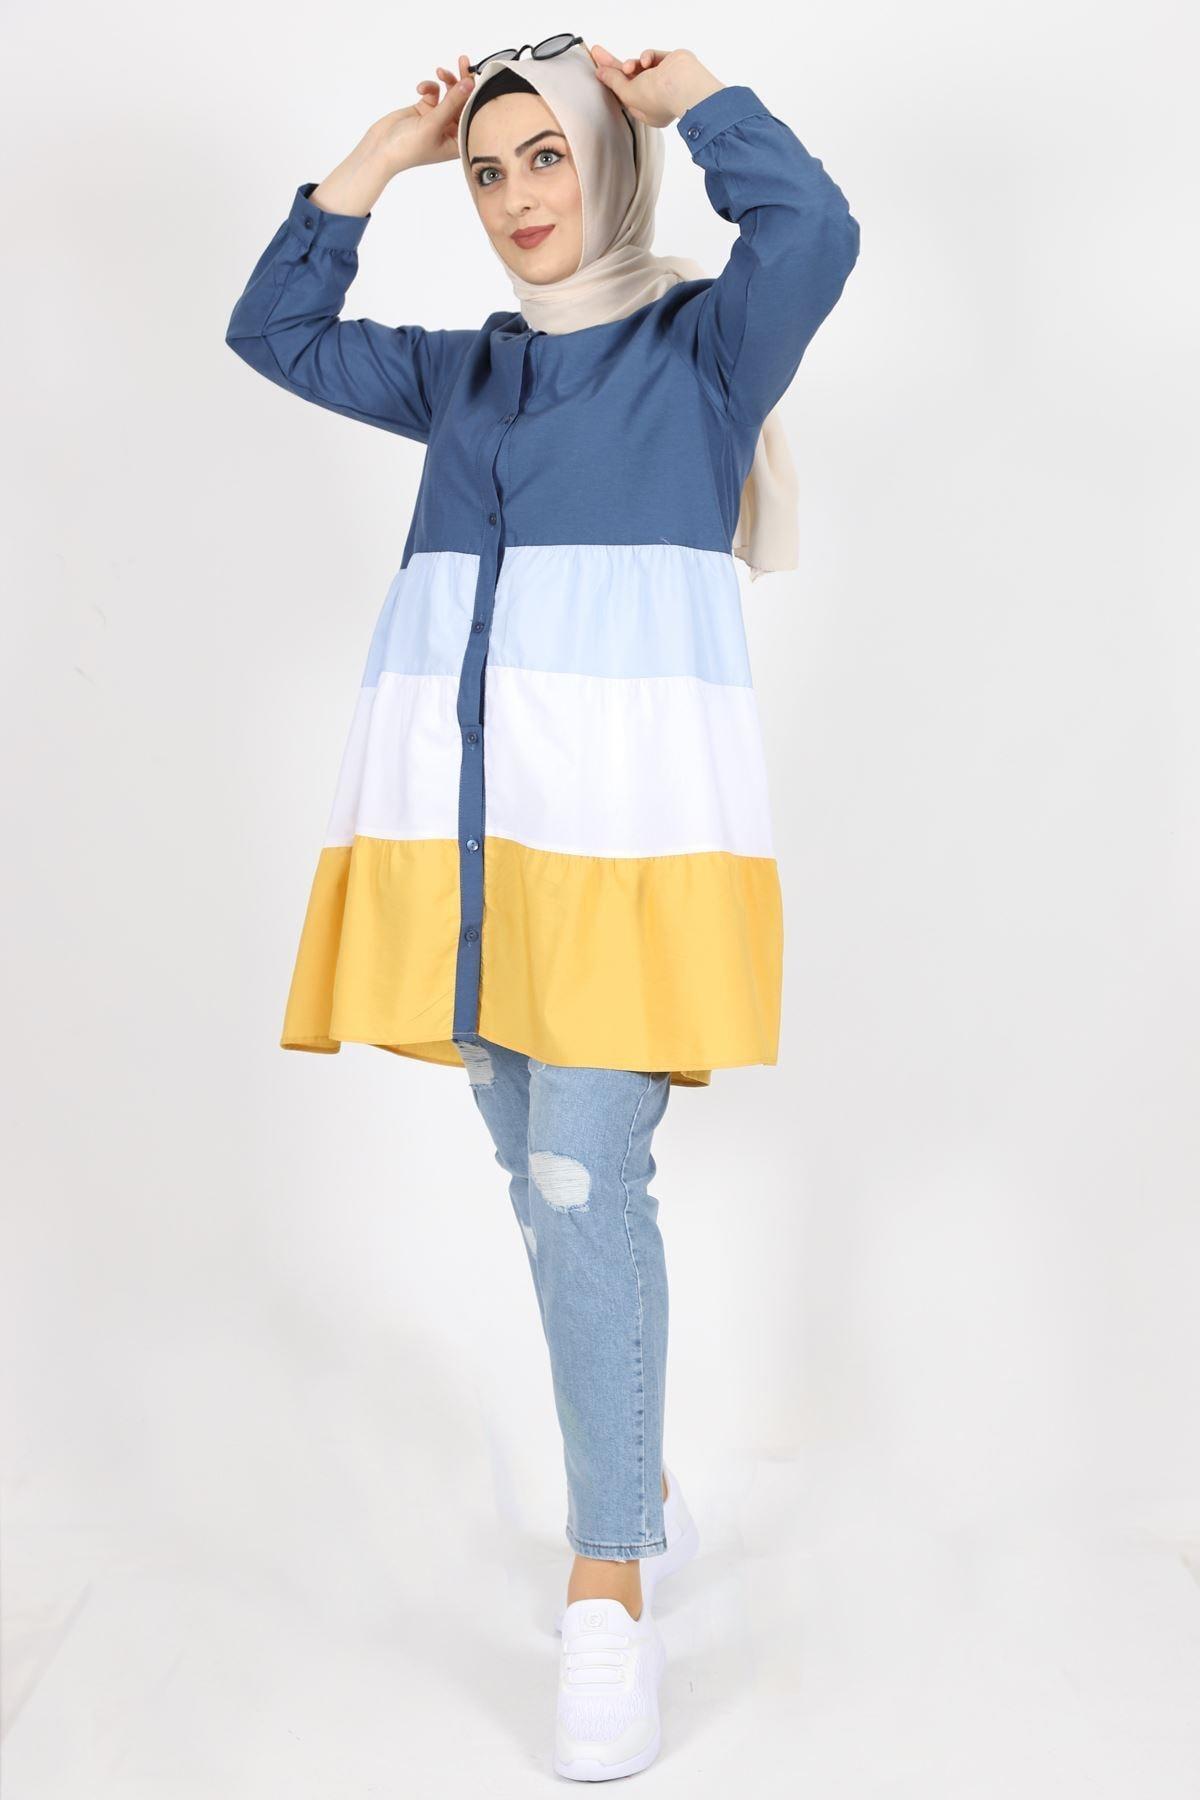 7101 Cotton Kumaş Bayan Gömlek Tunik - Lacivert